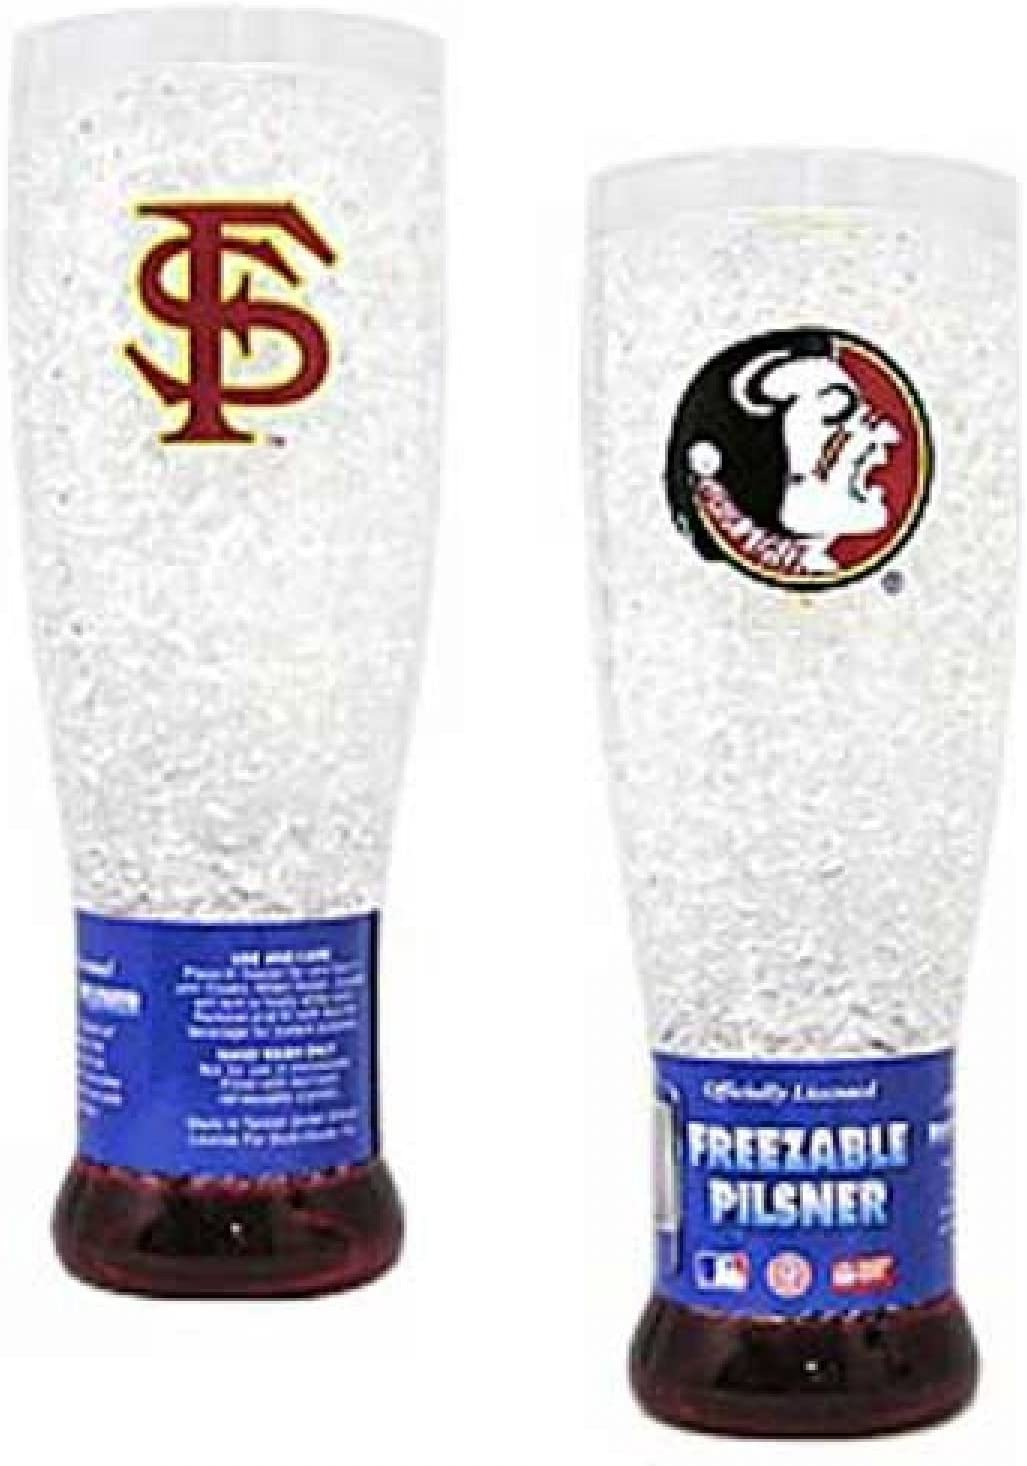 20 oz FSU Freezable Pilsner Florida State Seminoles